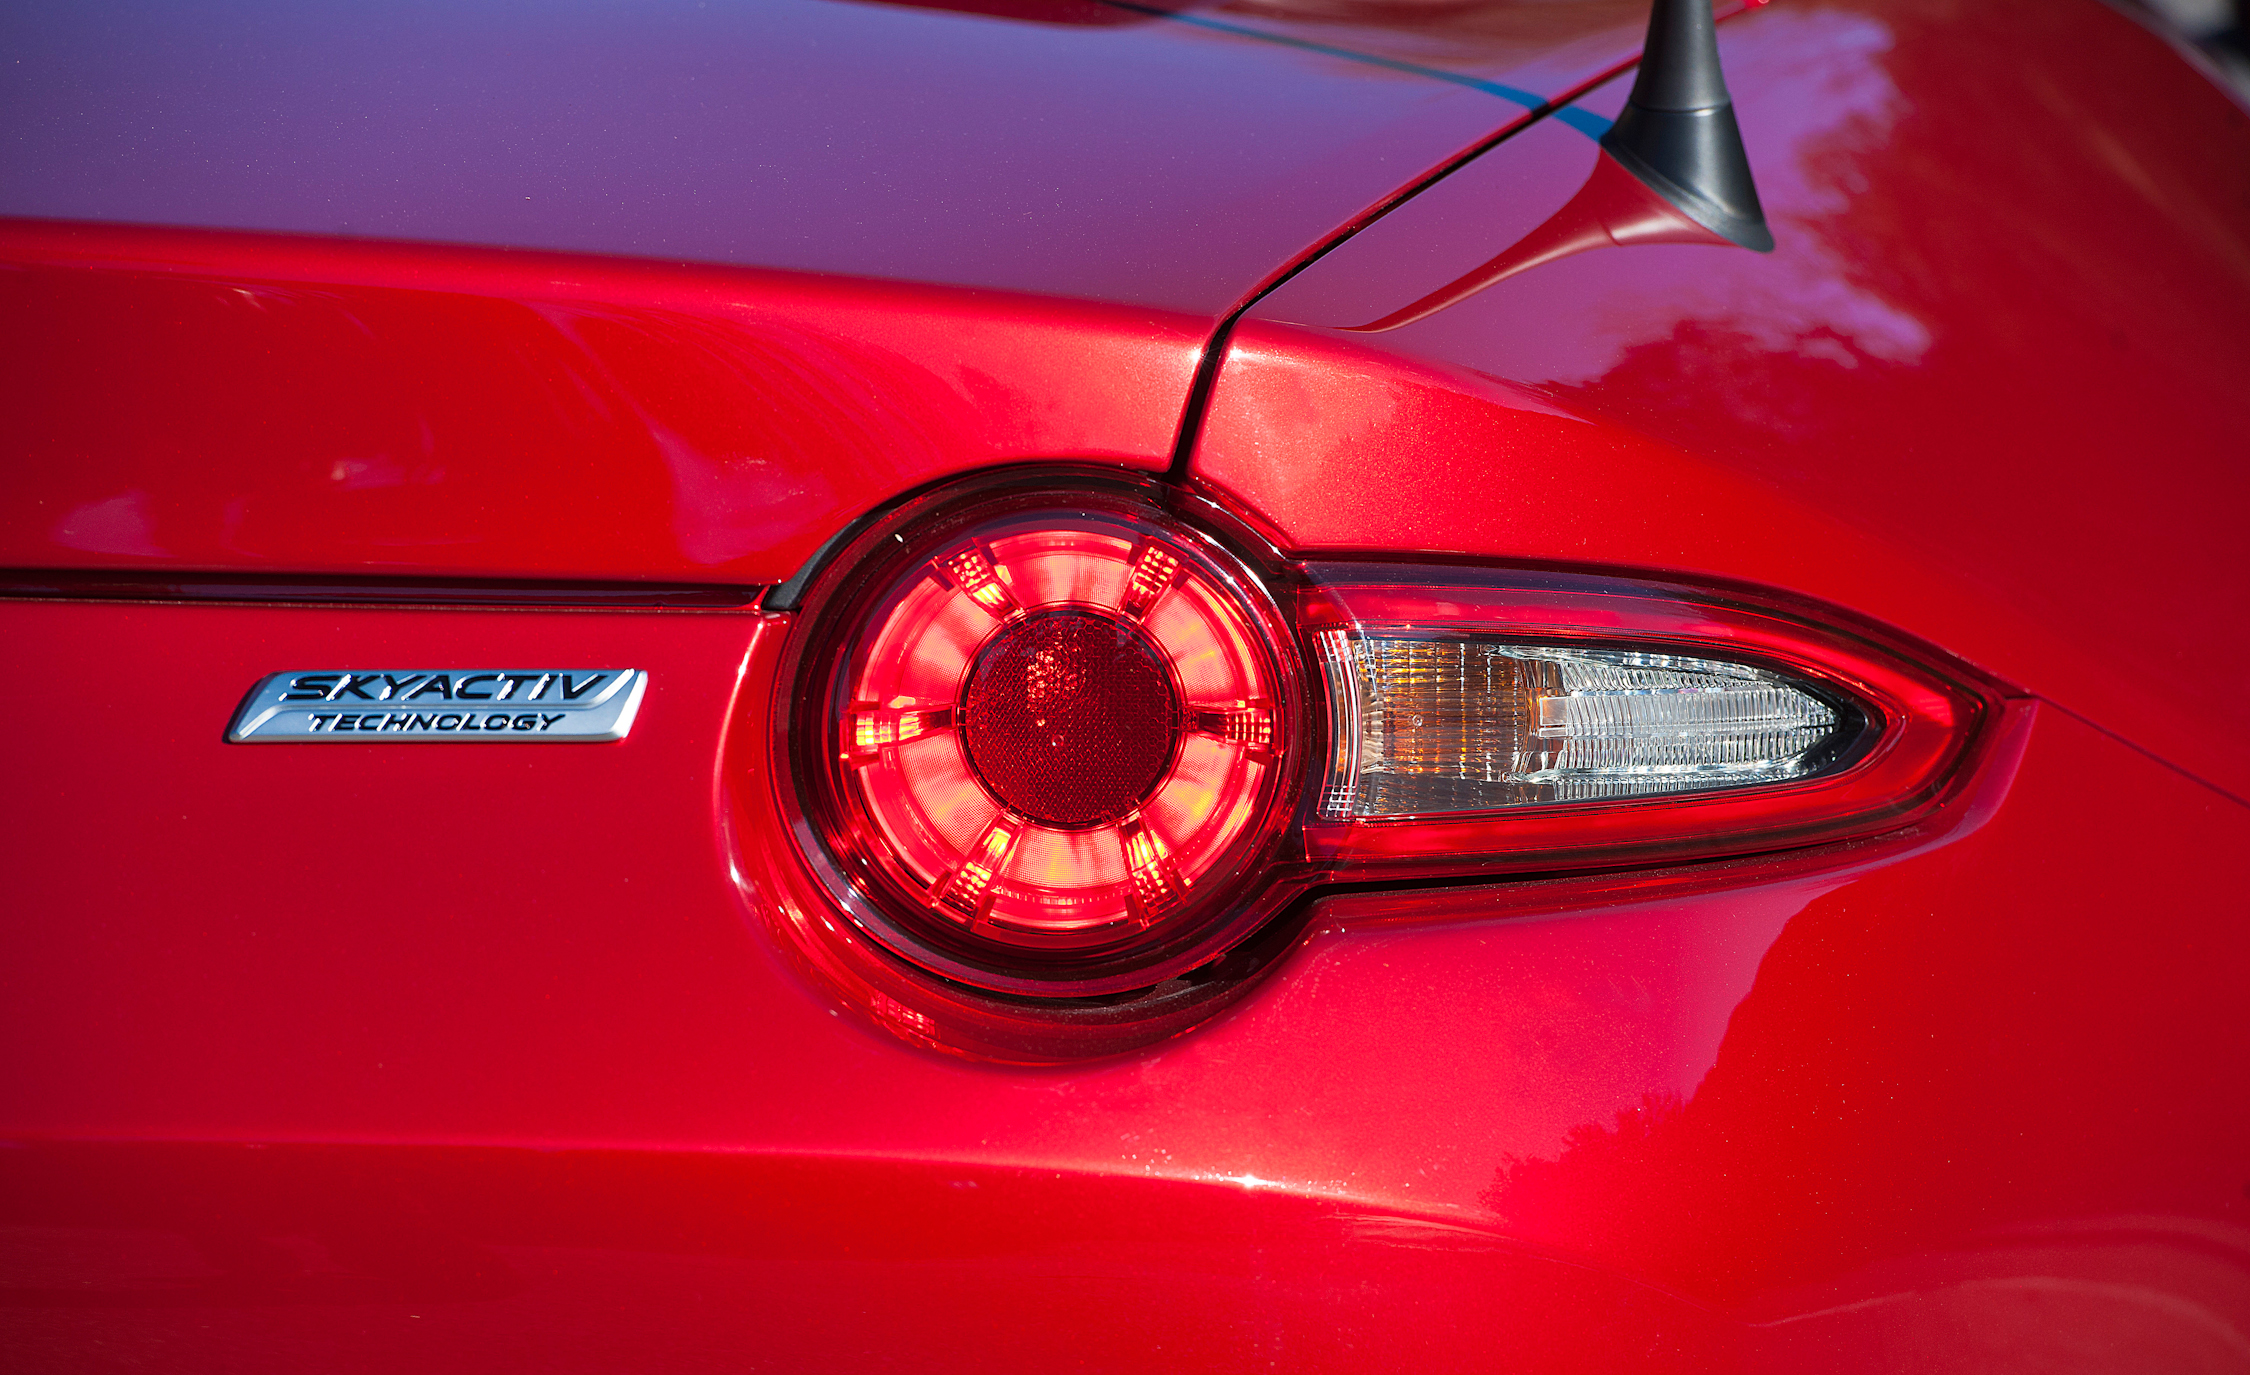 2016 Mazda MX-5 Miata Right Taillight and Emblem